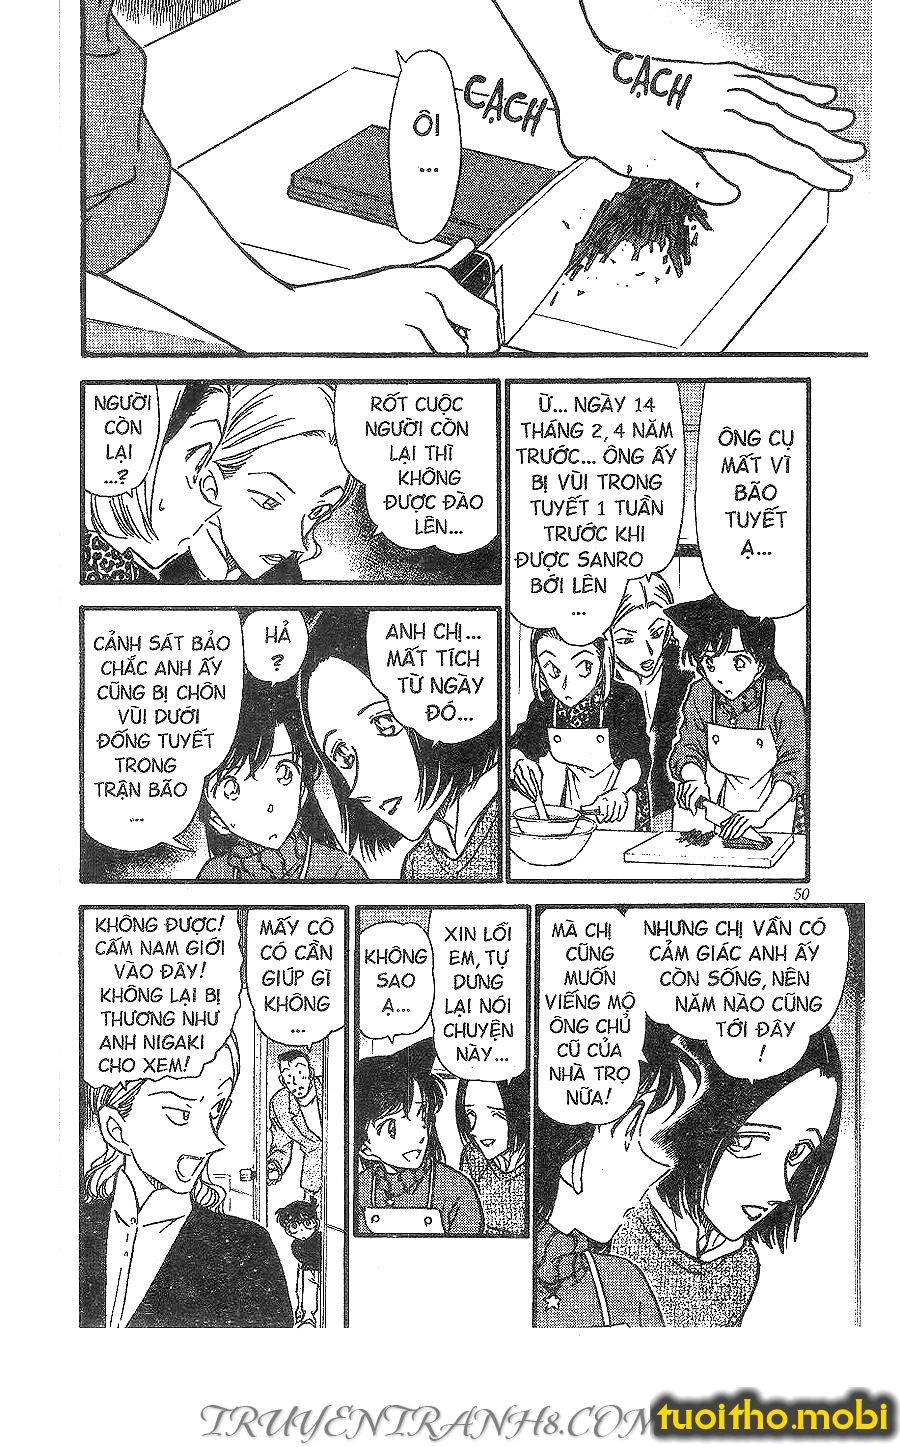 conan chương 331 trang 13